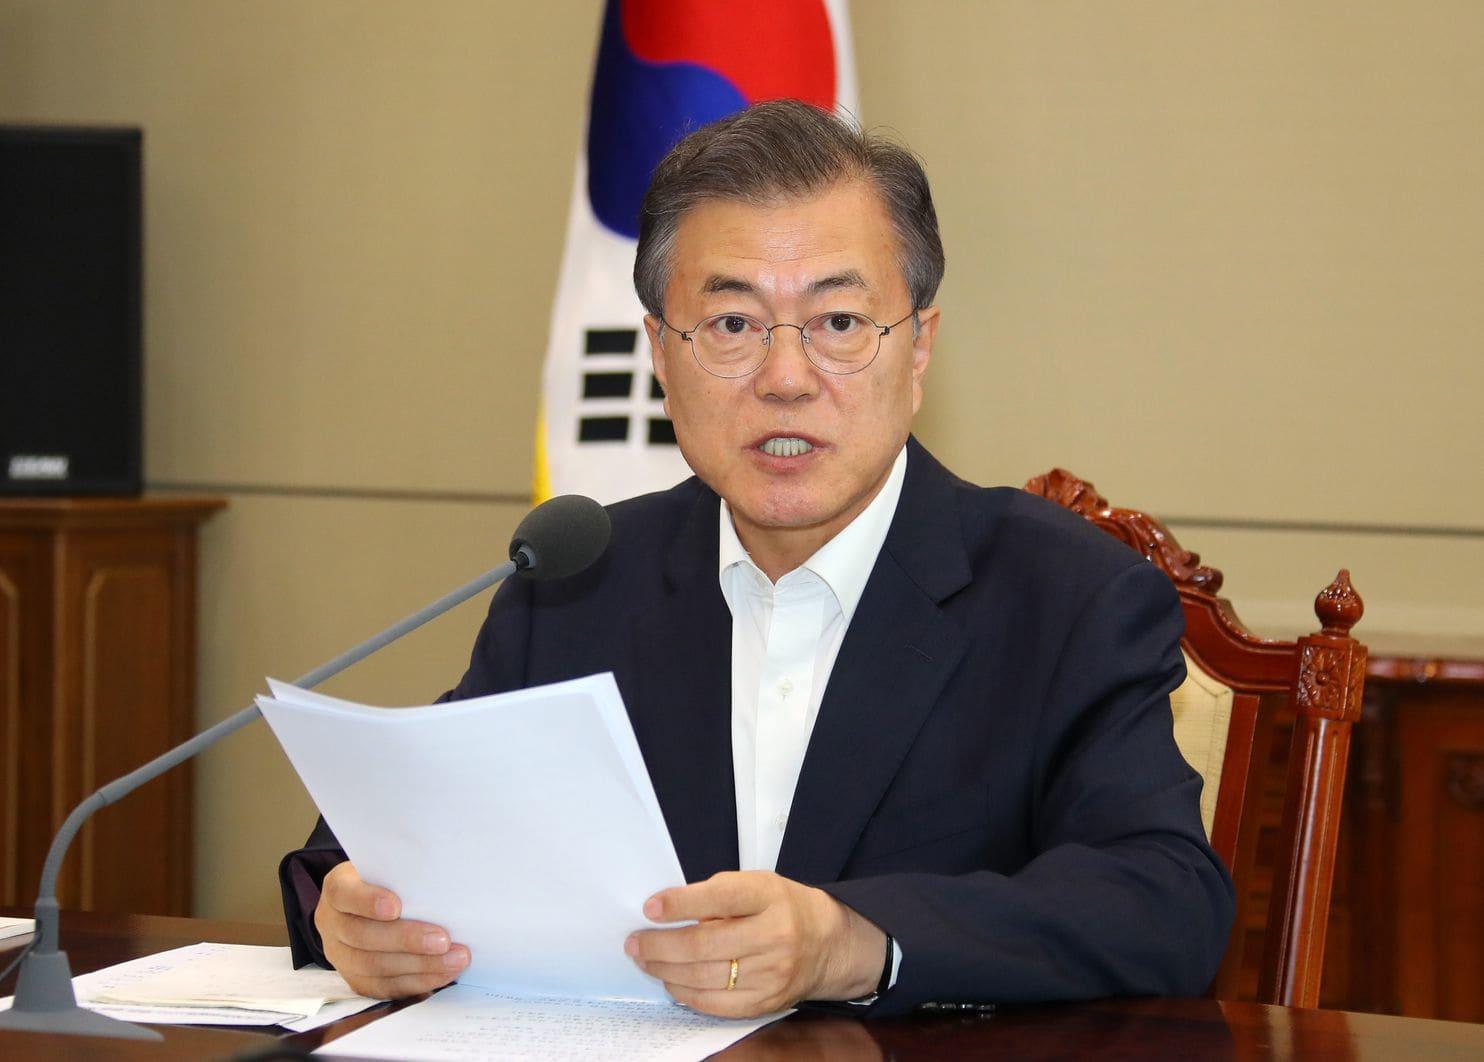 S. Korea's leader praises North's plan to dismantle nuke site